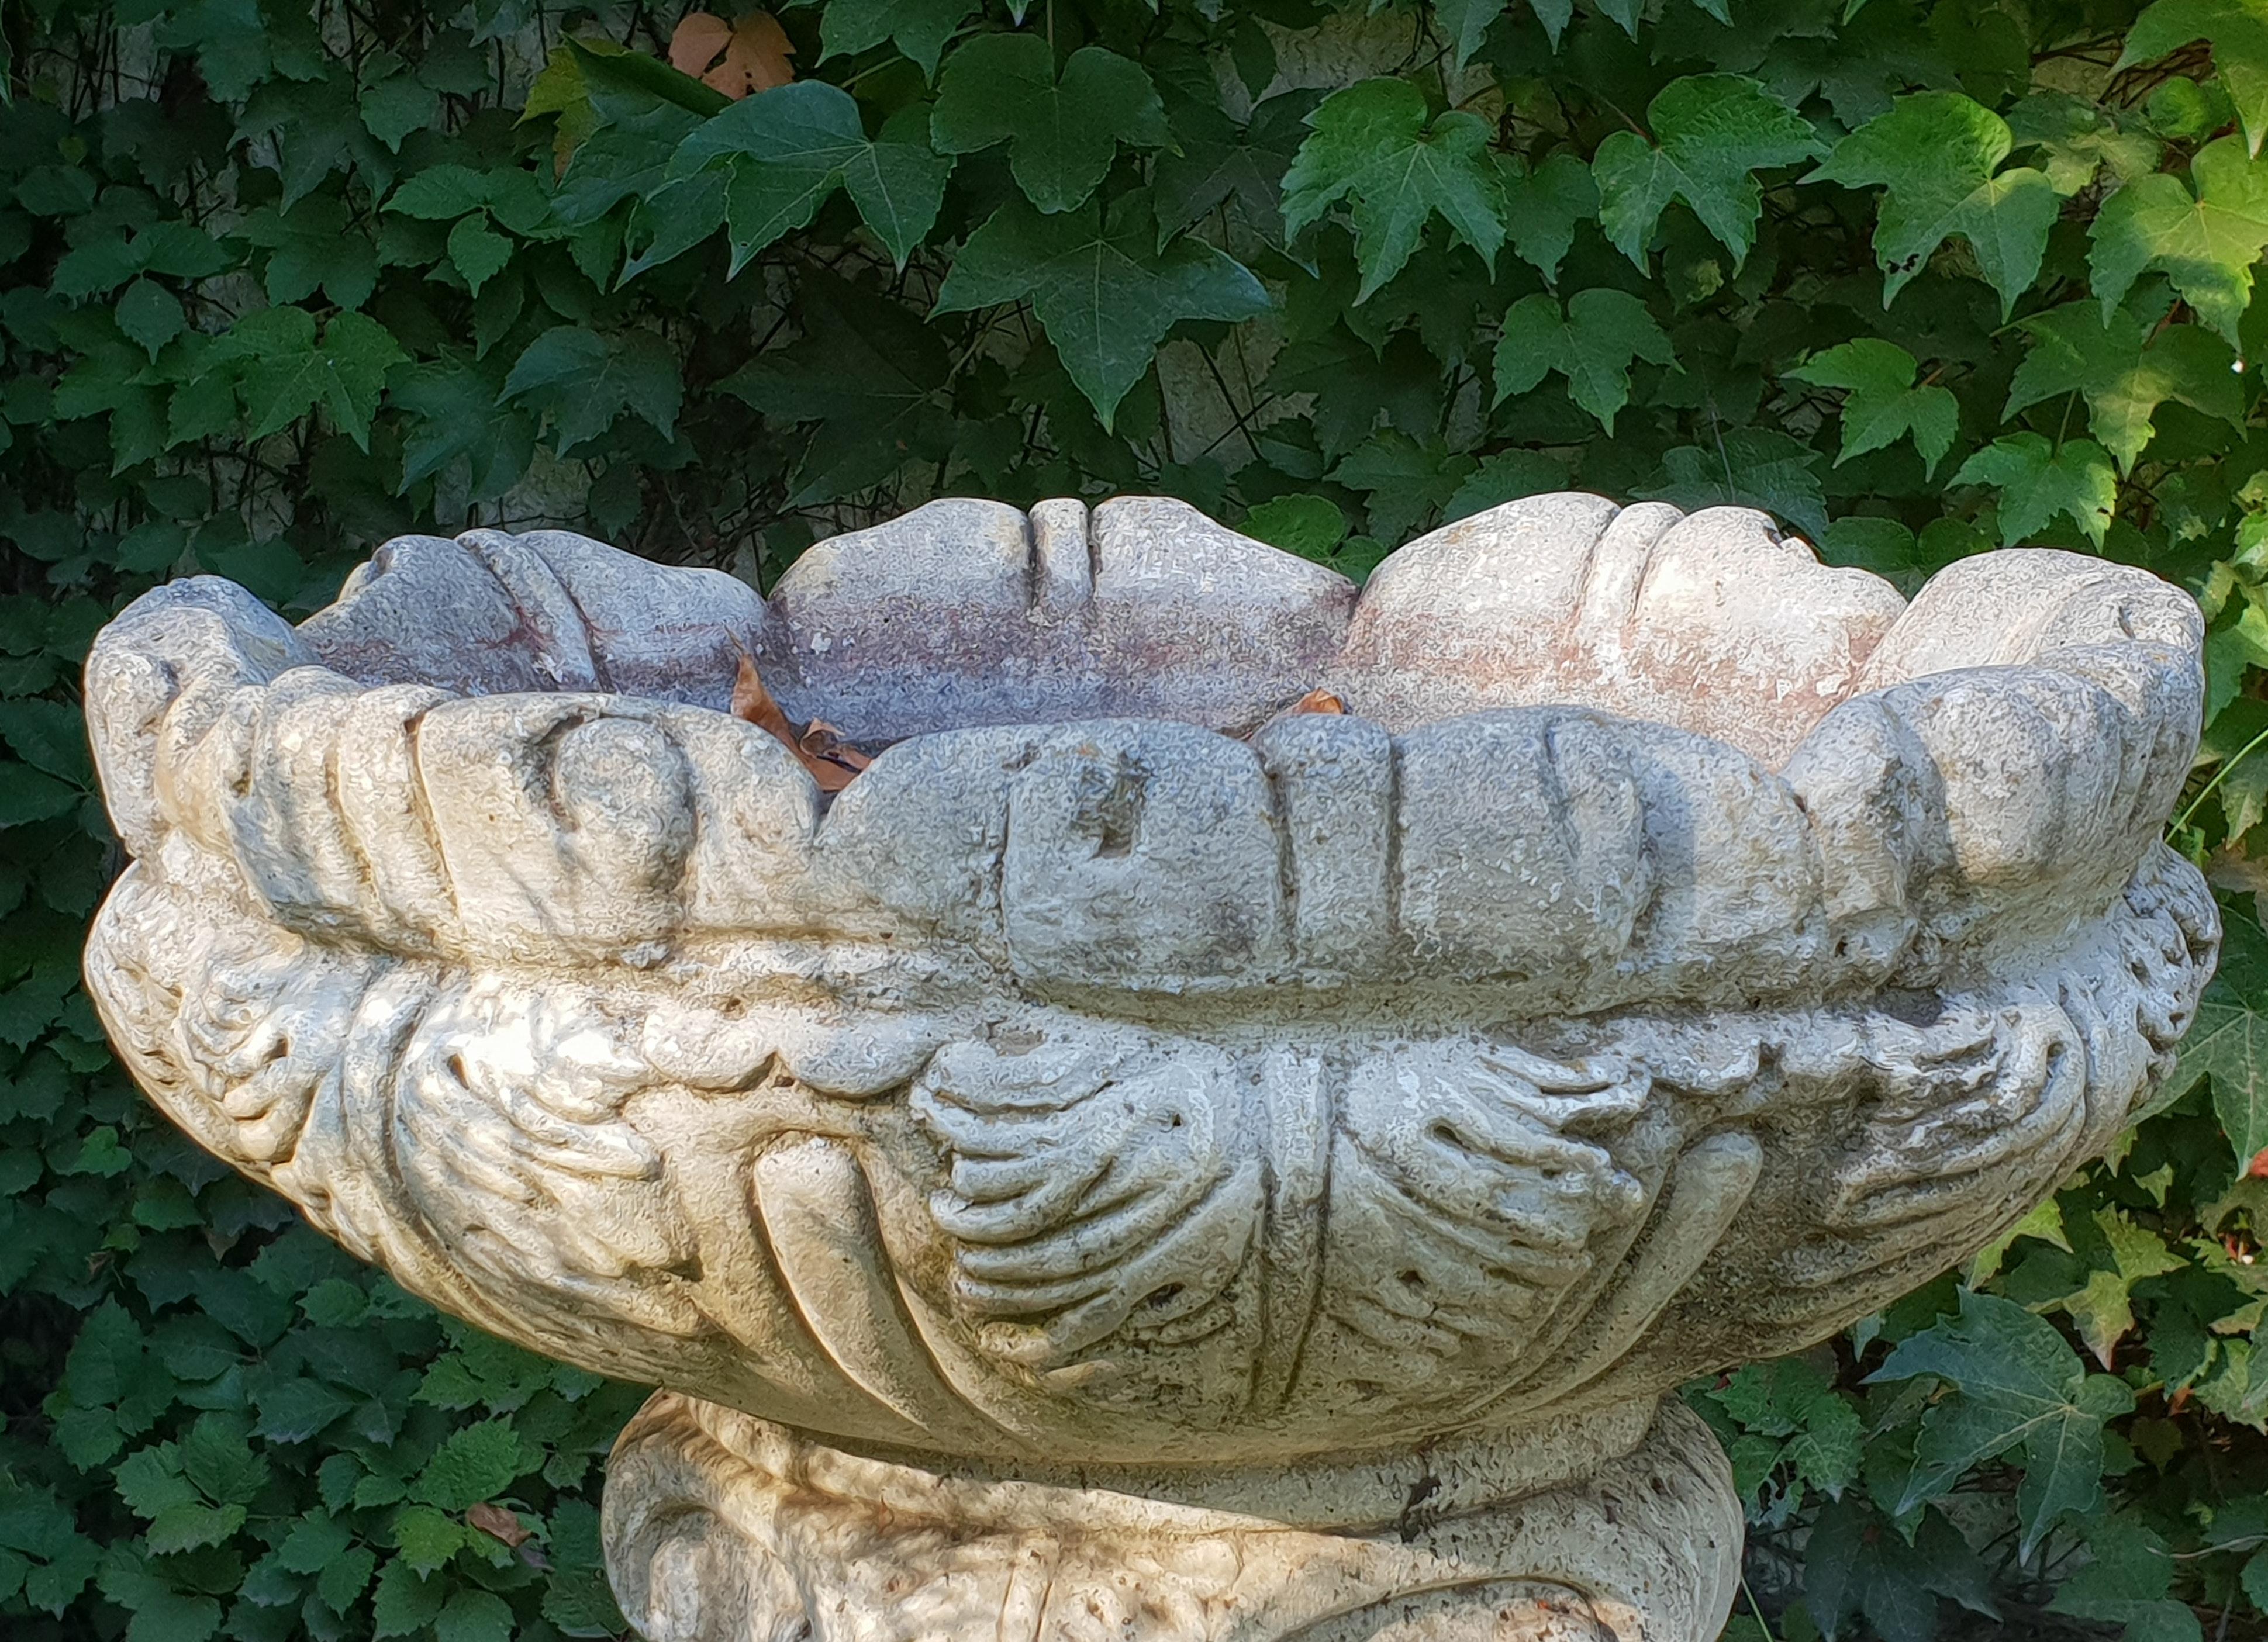 Stone vase in the garden photo